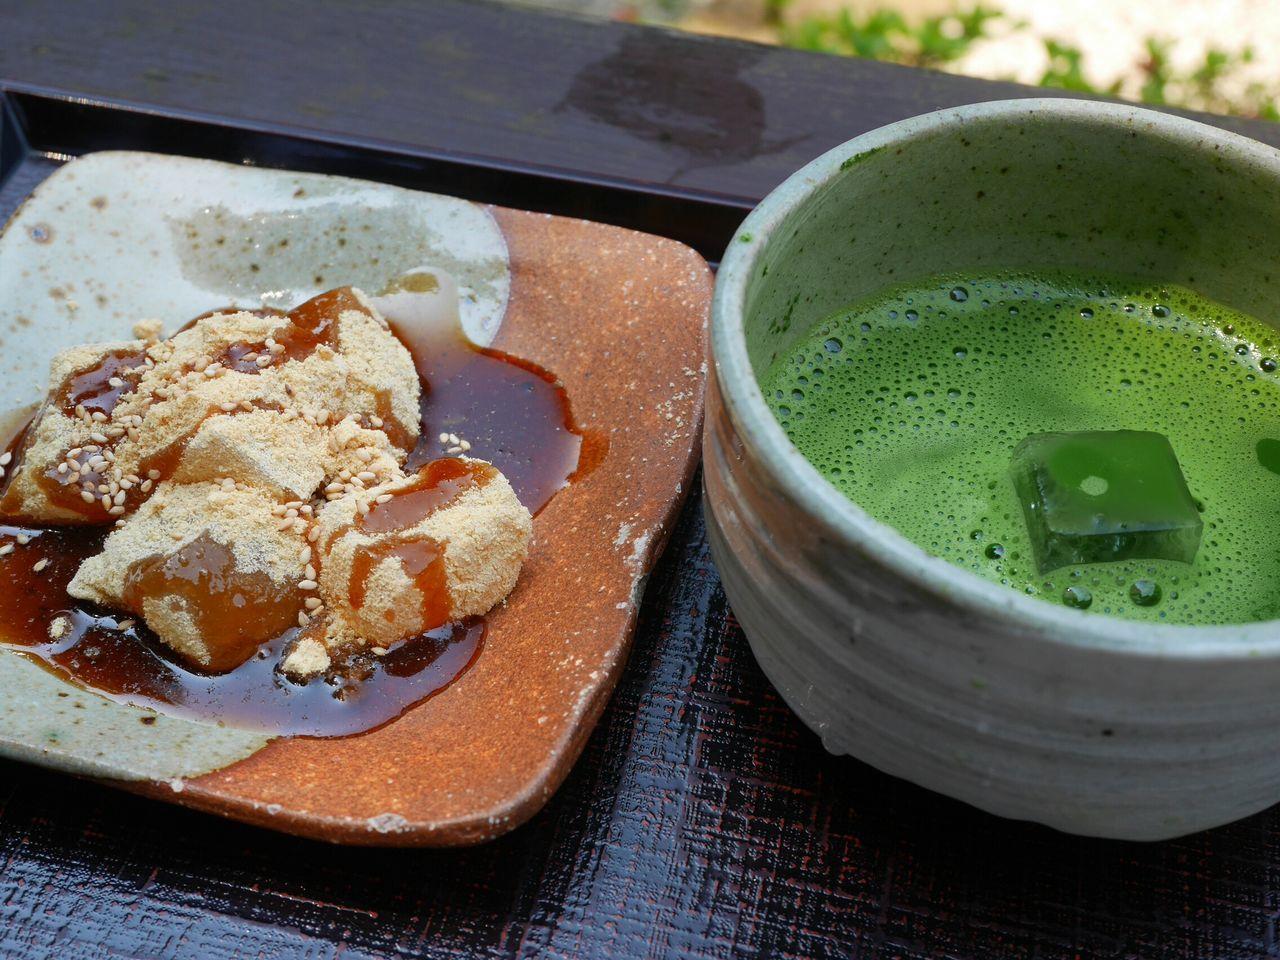 Street Food Worldwide わらび餅 鎌倉 First Eyeem Photo